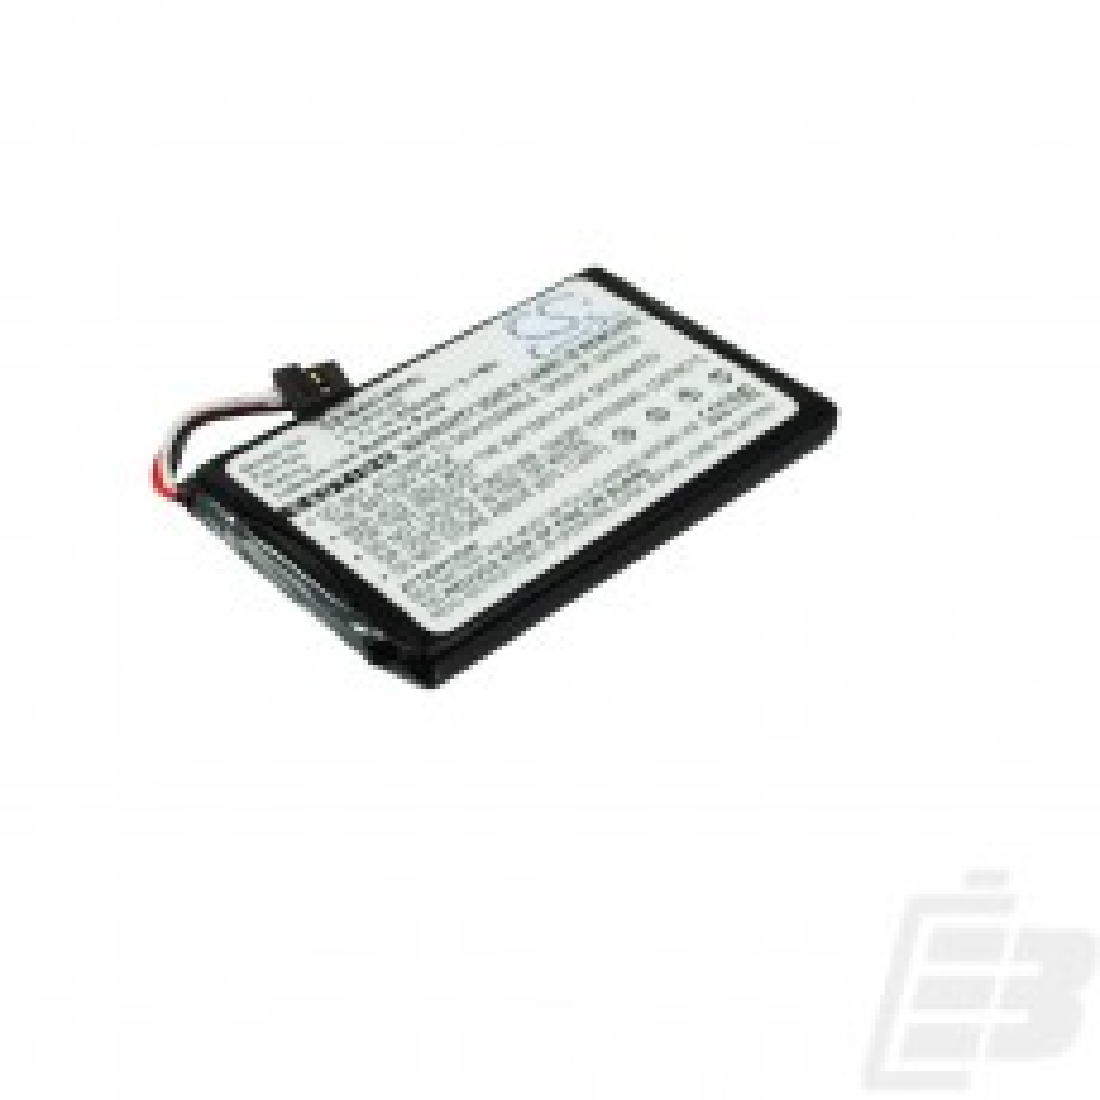 GPS battery Navigon 1400_1